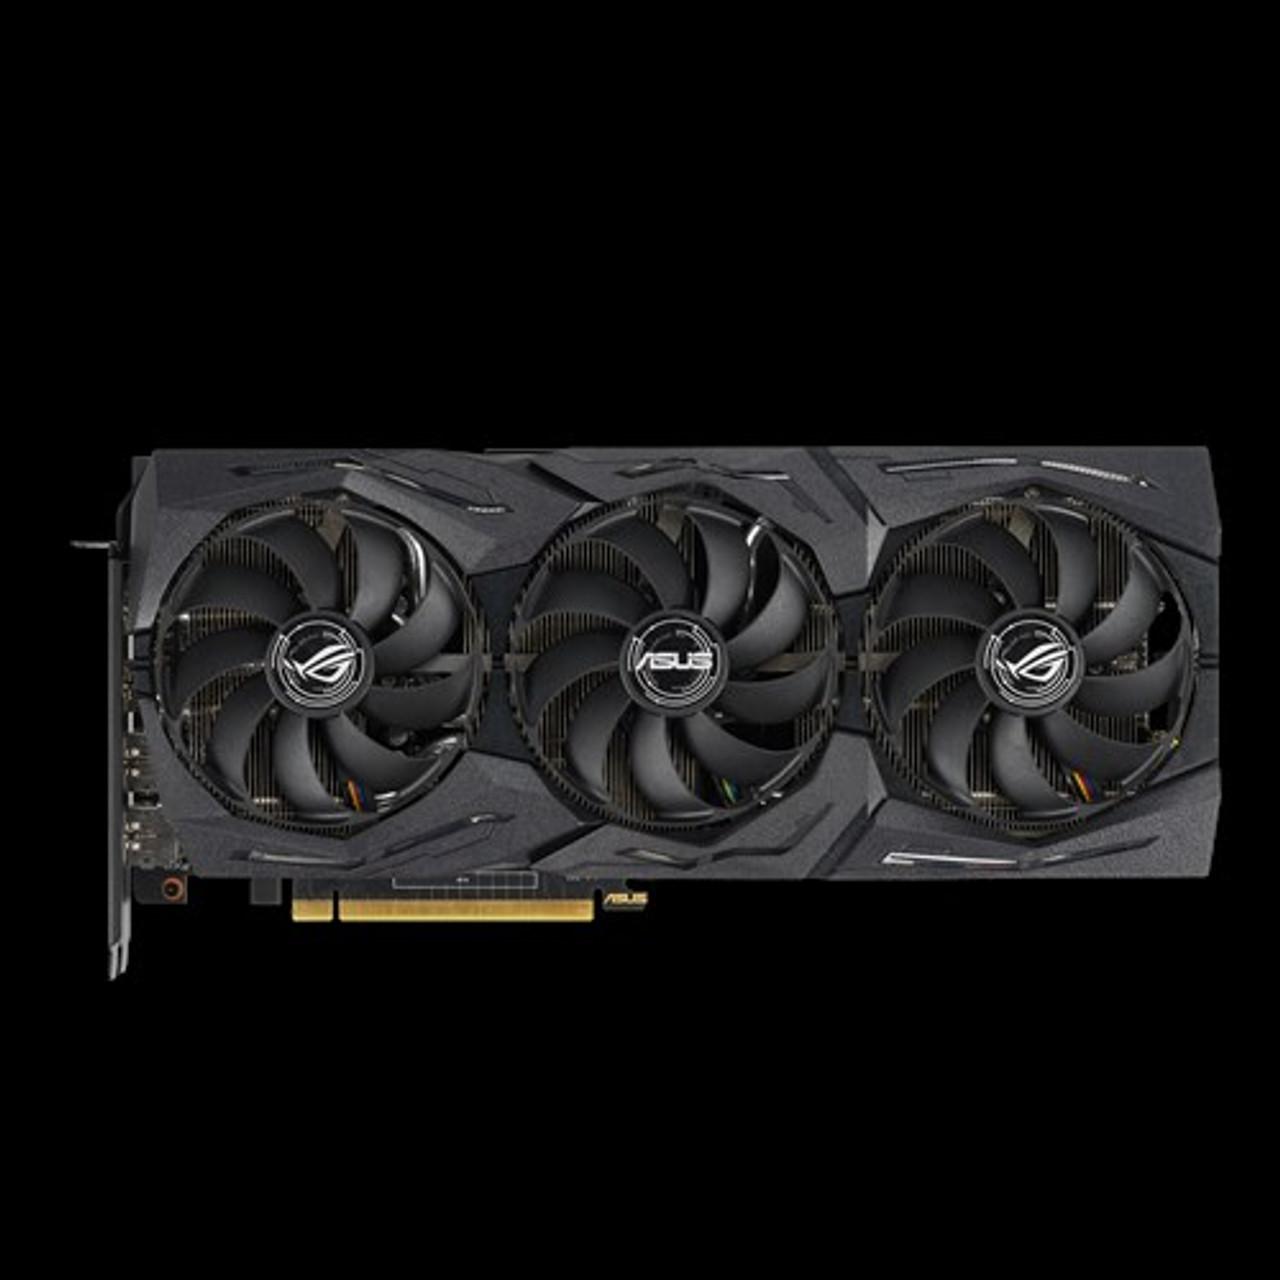 ROG GTX 1660TI GDDR5 6GB, Overclock Mode, Aura Sync, PCI Express 3 0